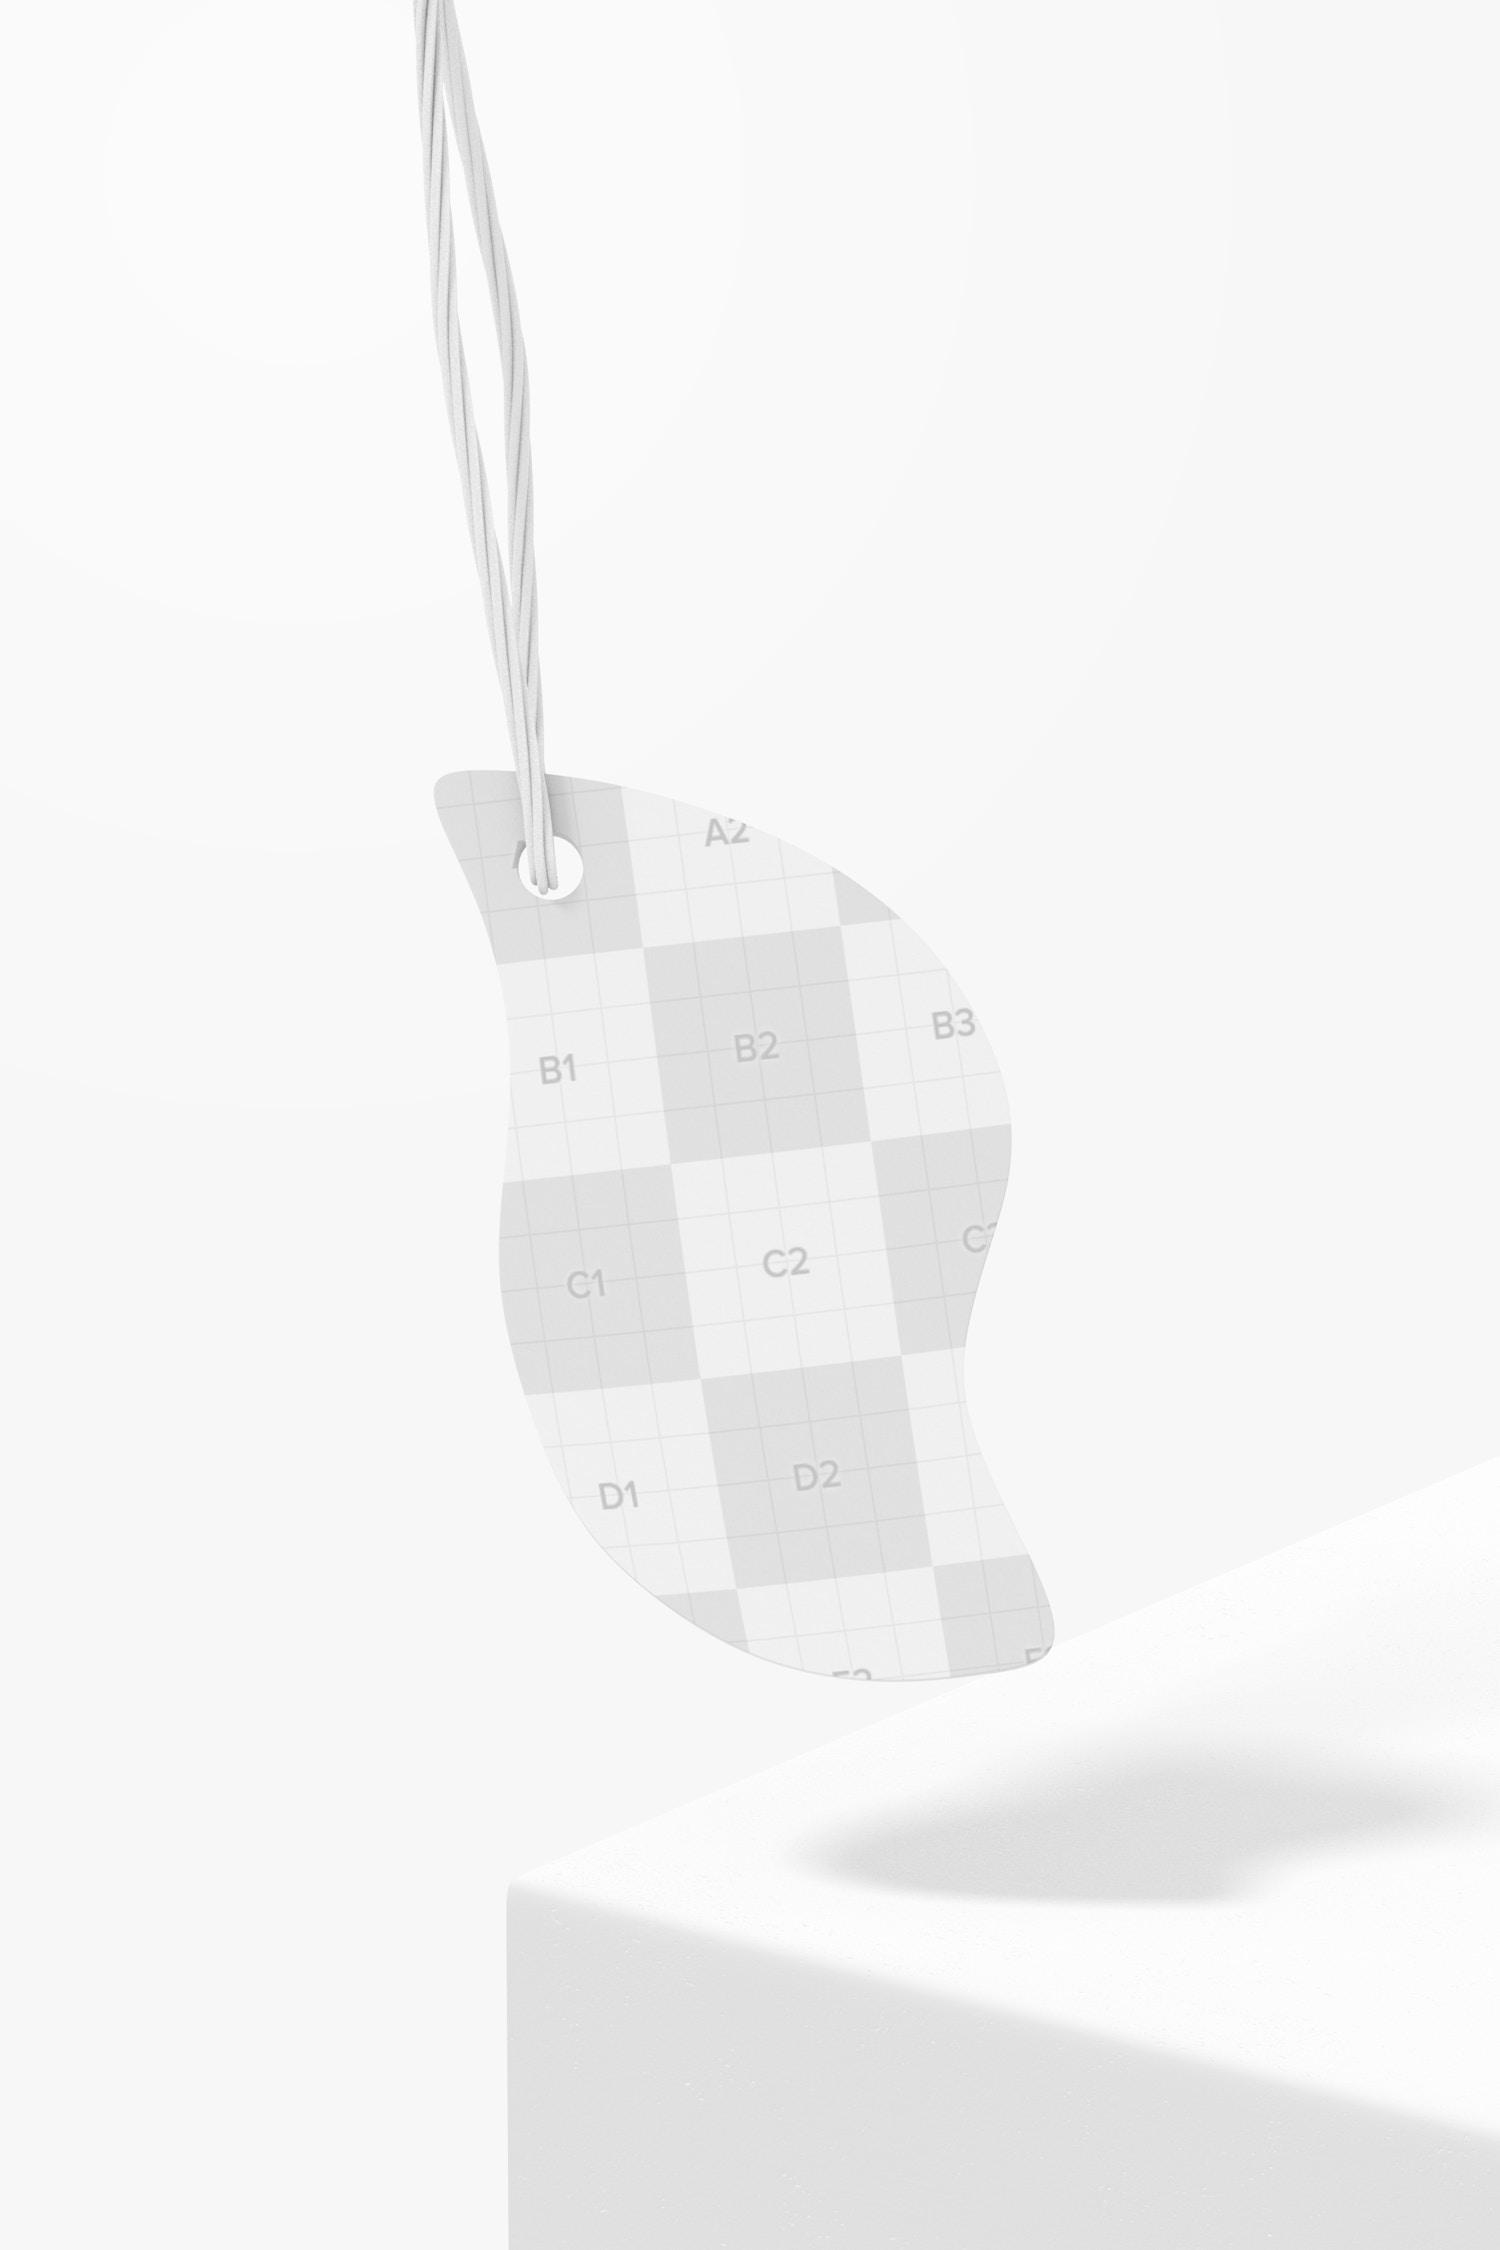 Leaf Shaped Cardboard Tag Mockup, Falling